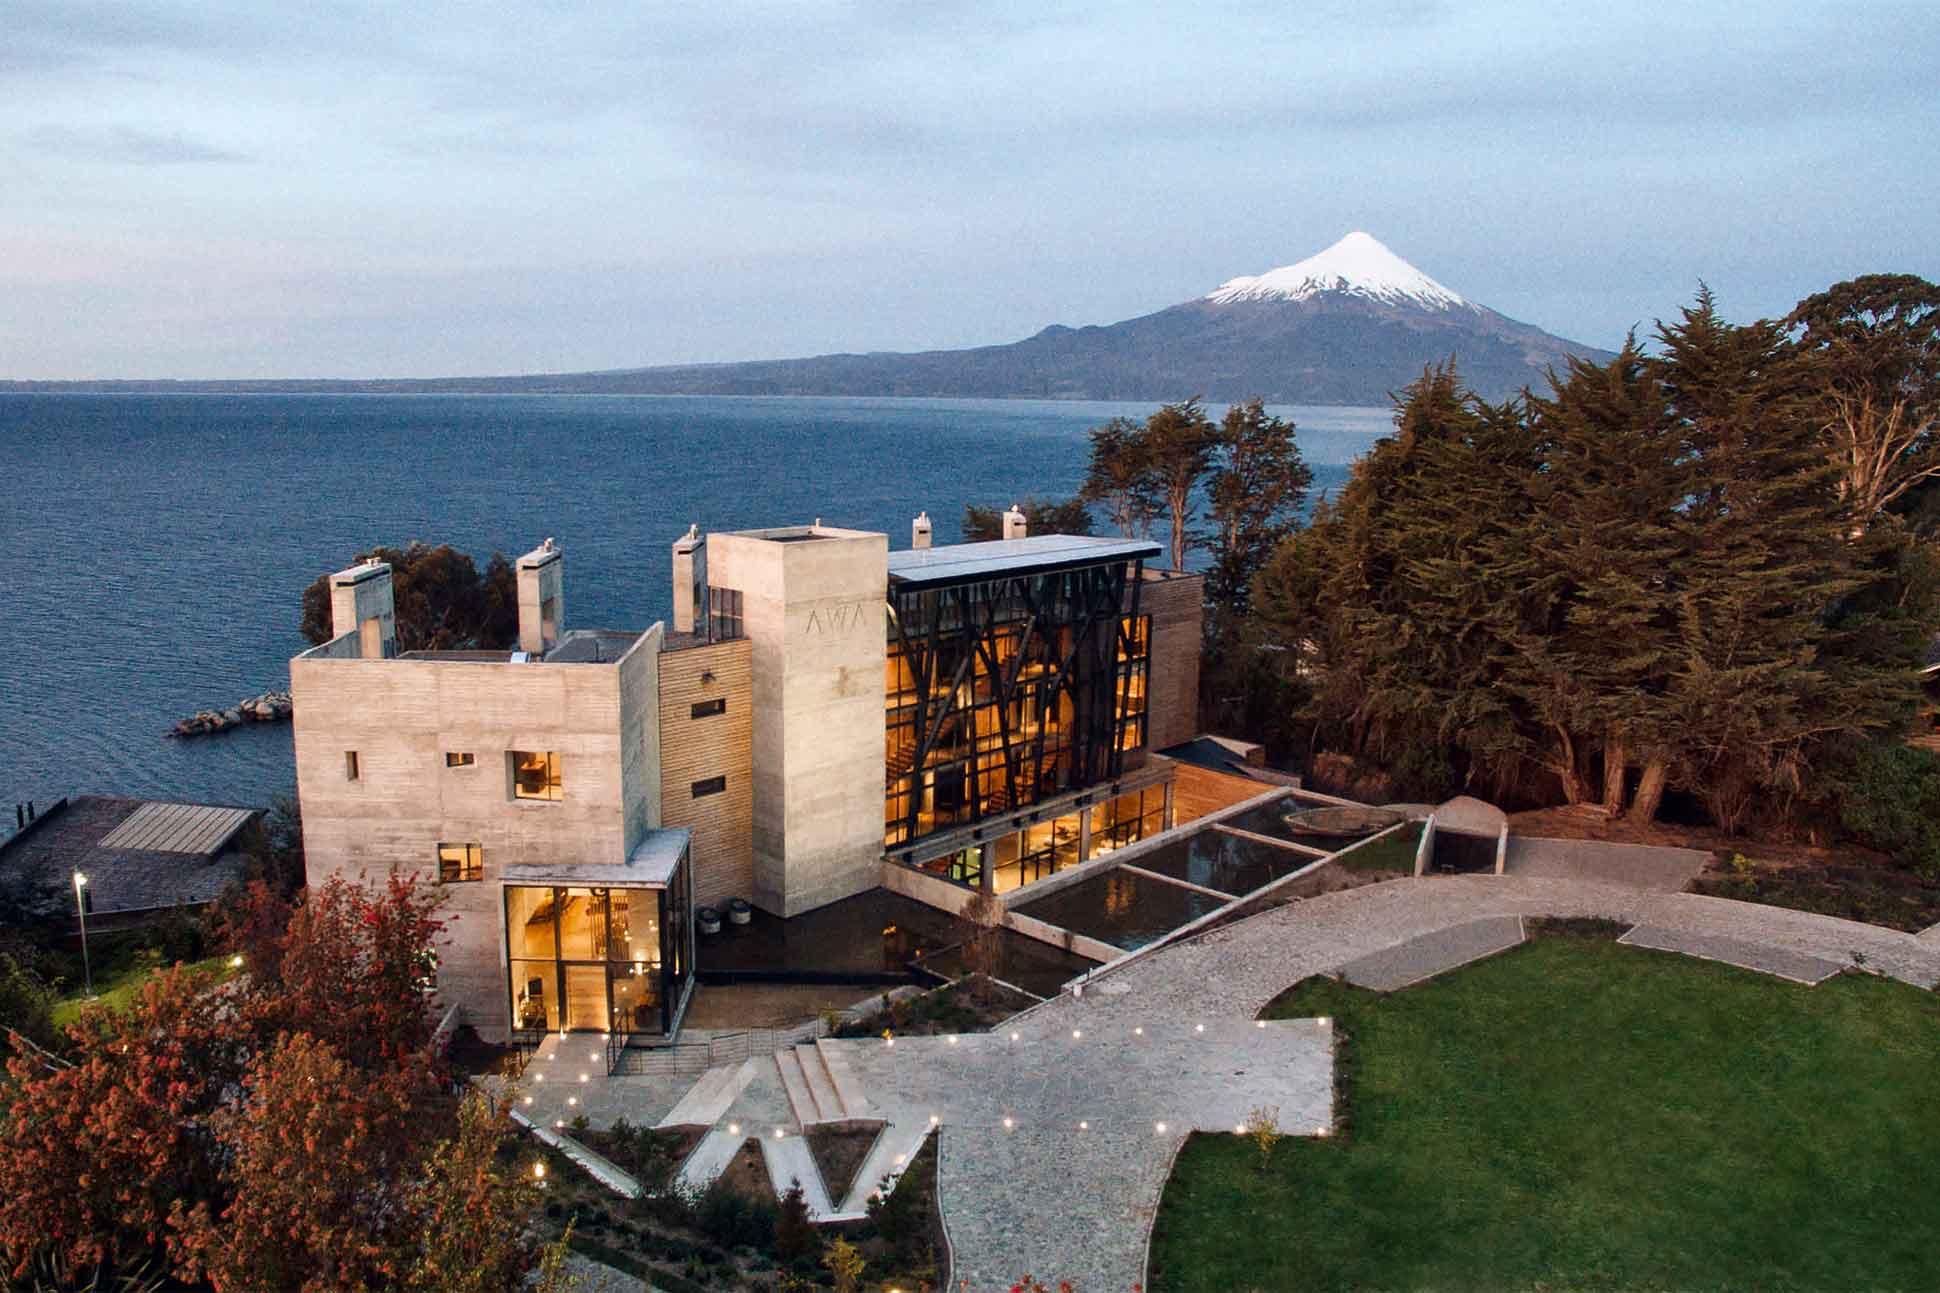 Aerial view of Hotel AWA, Puerto Varas, Chile